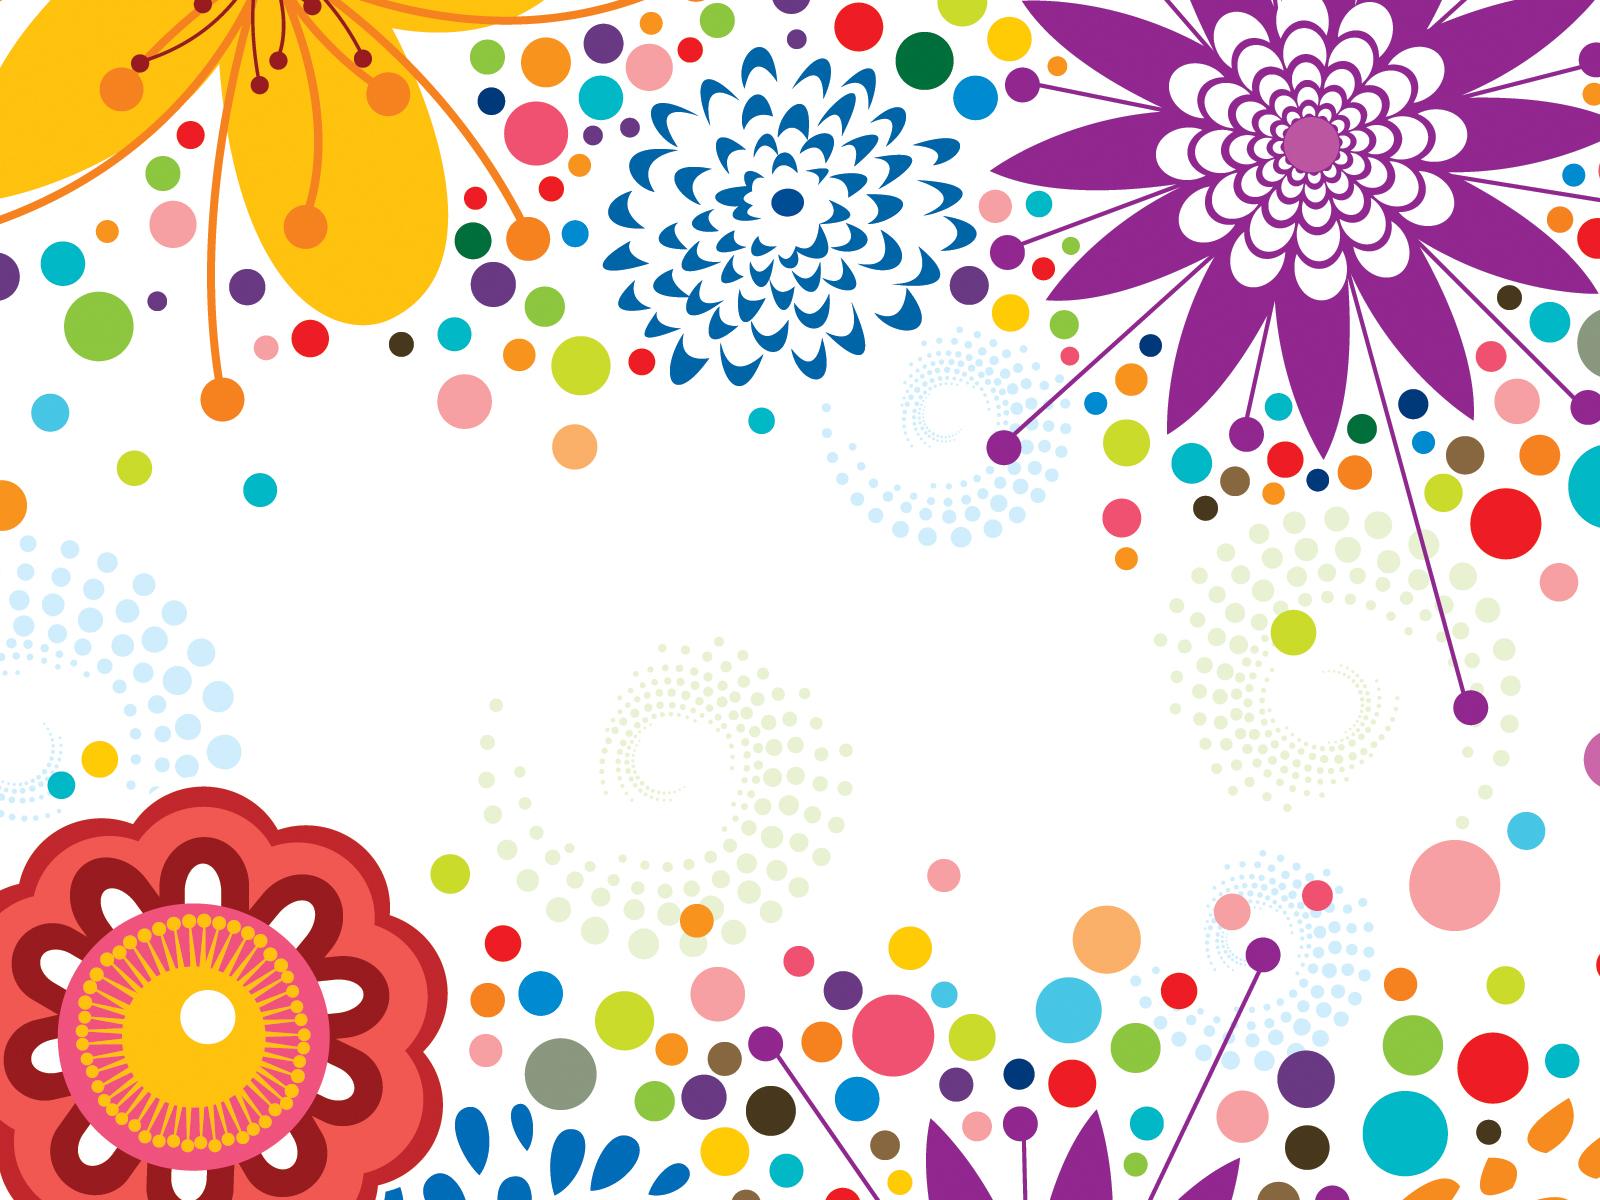 17 pretty border designs images free clip art page